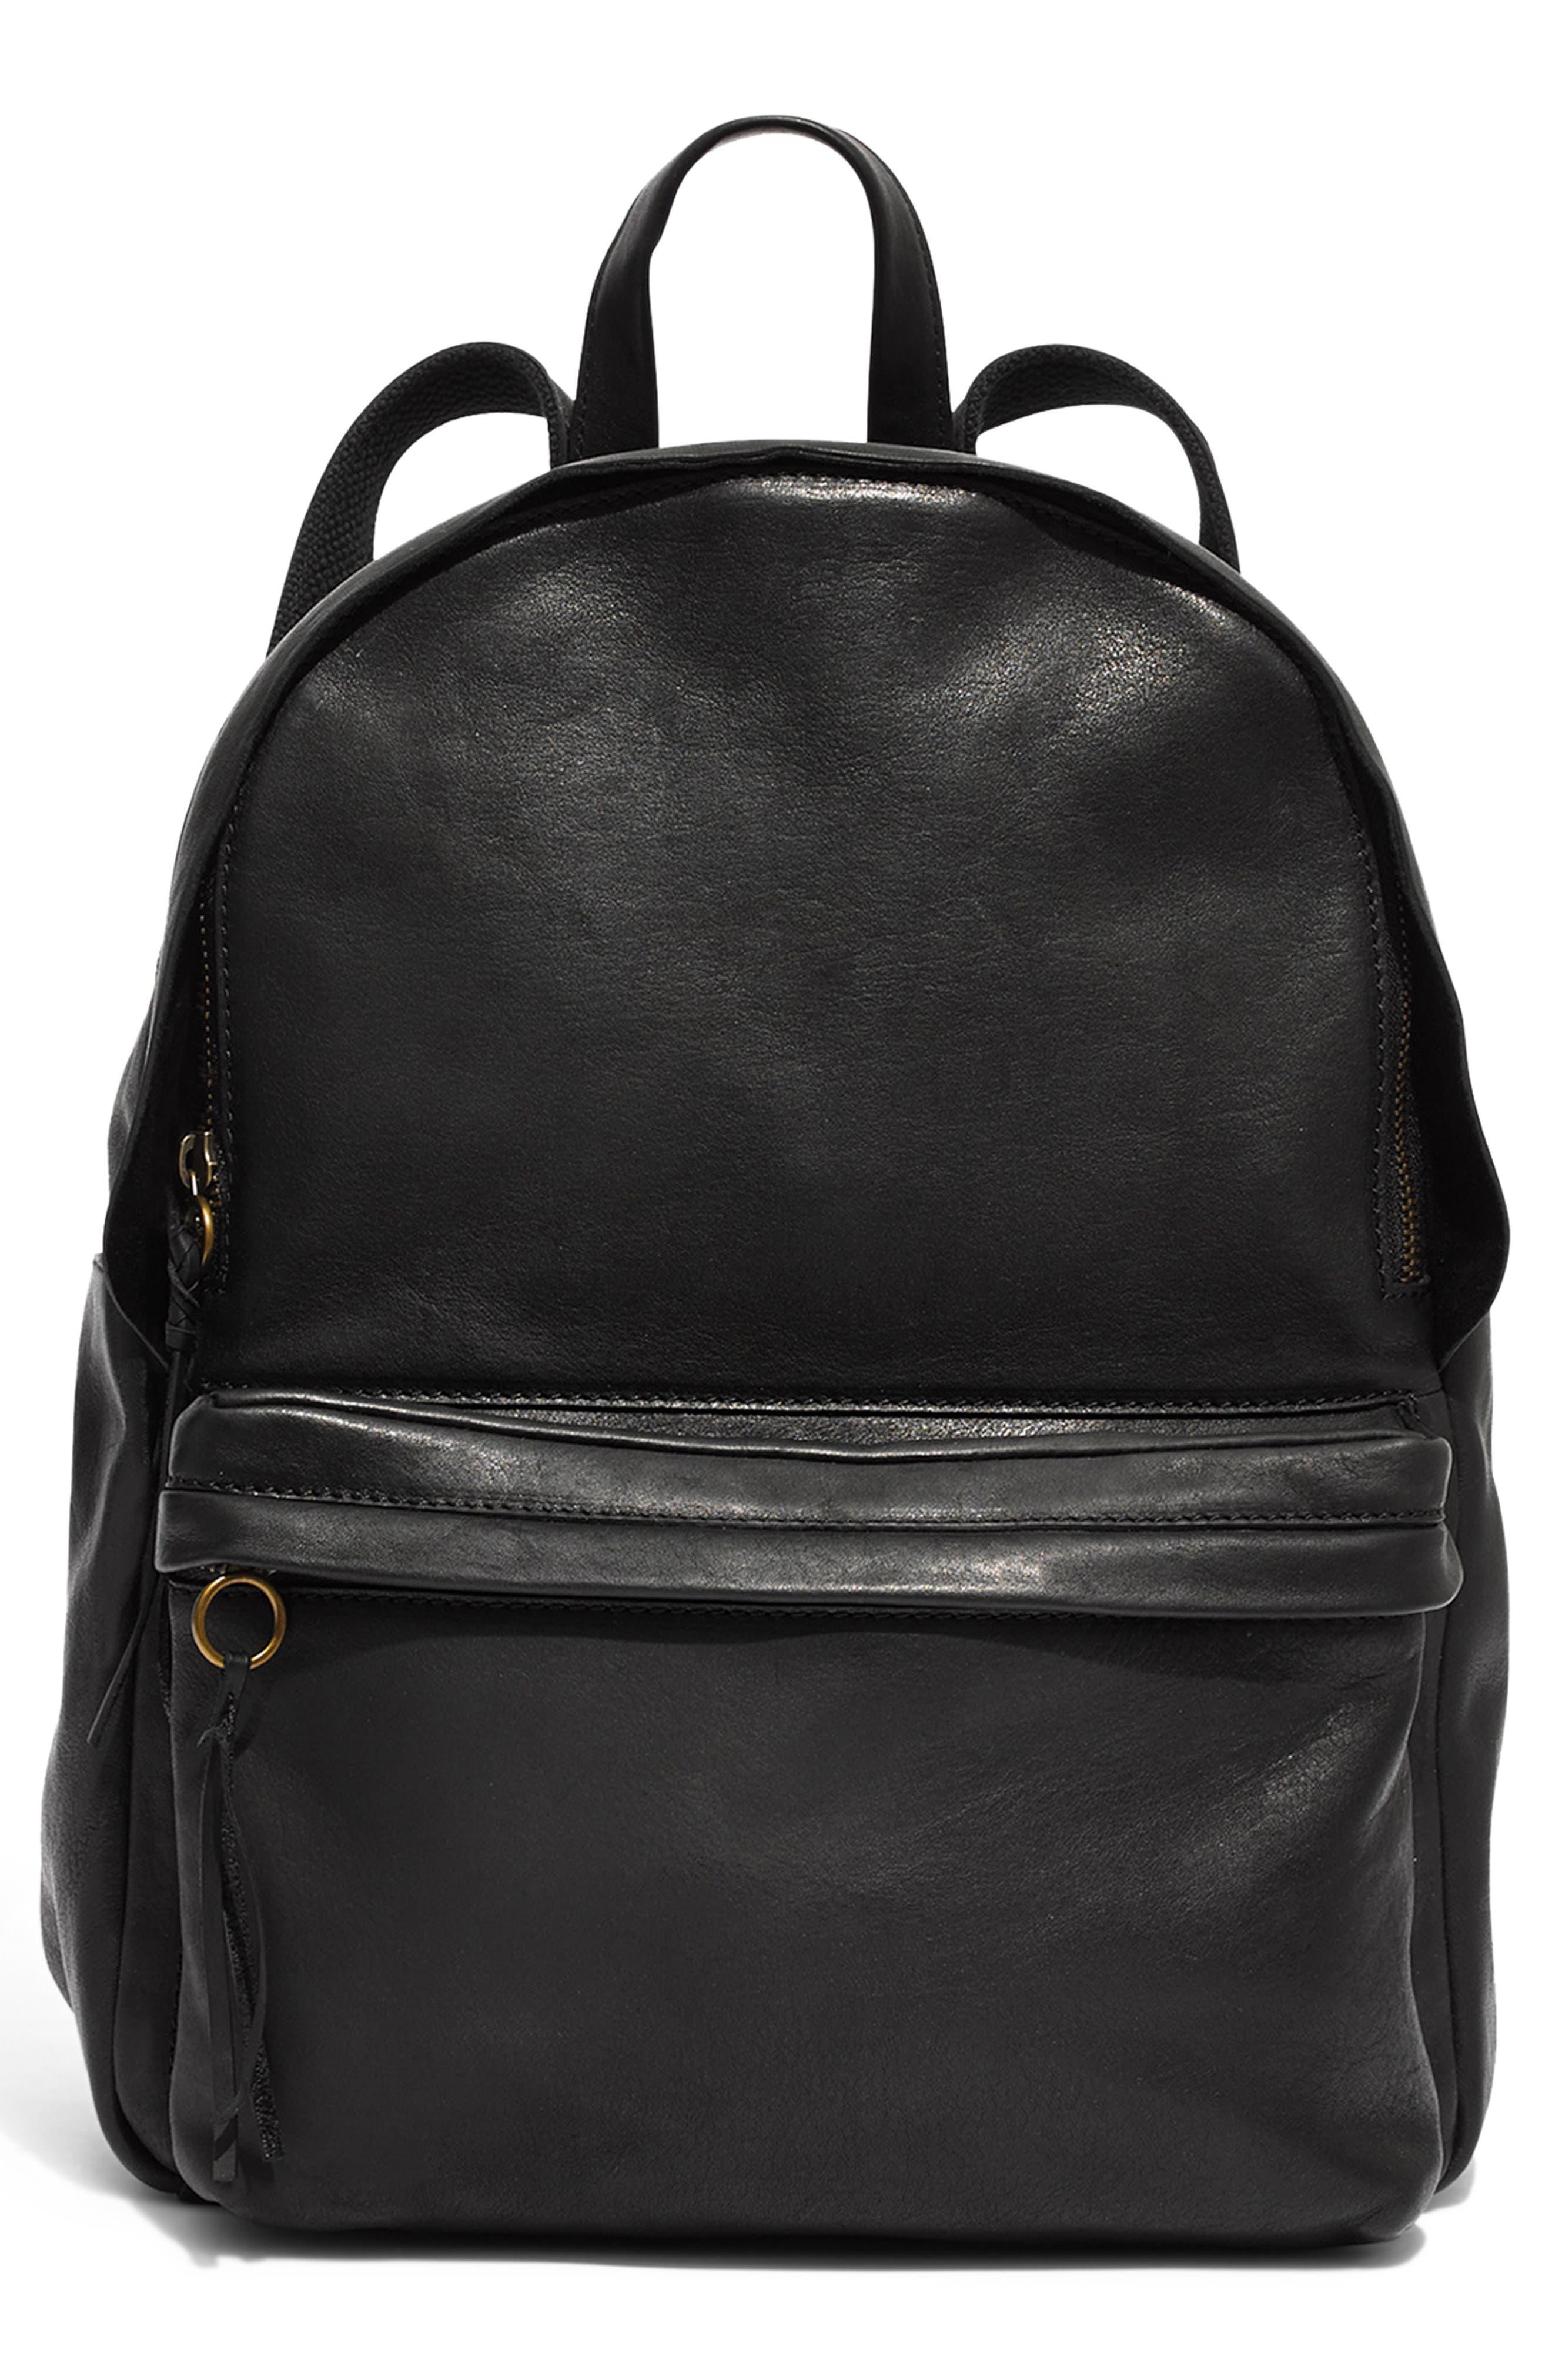 Lorimer Leather Backpack,                             Main thumbnail 1, color,                             TRUE BLACK